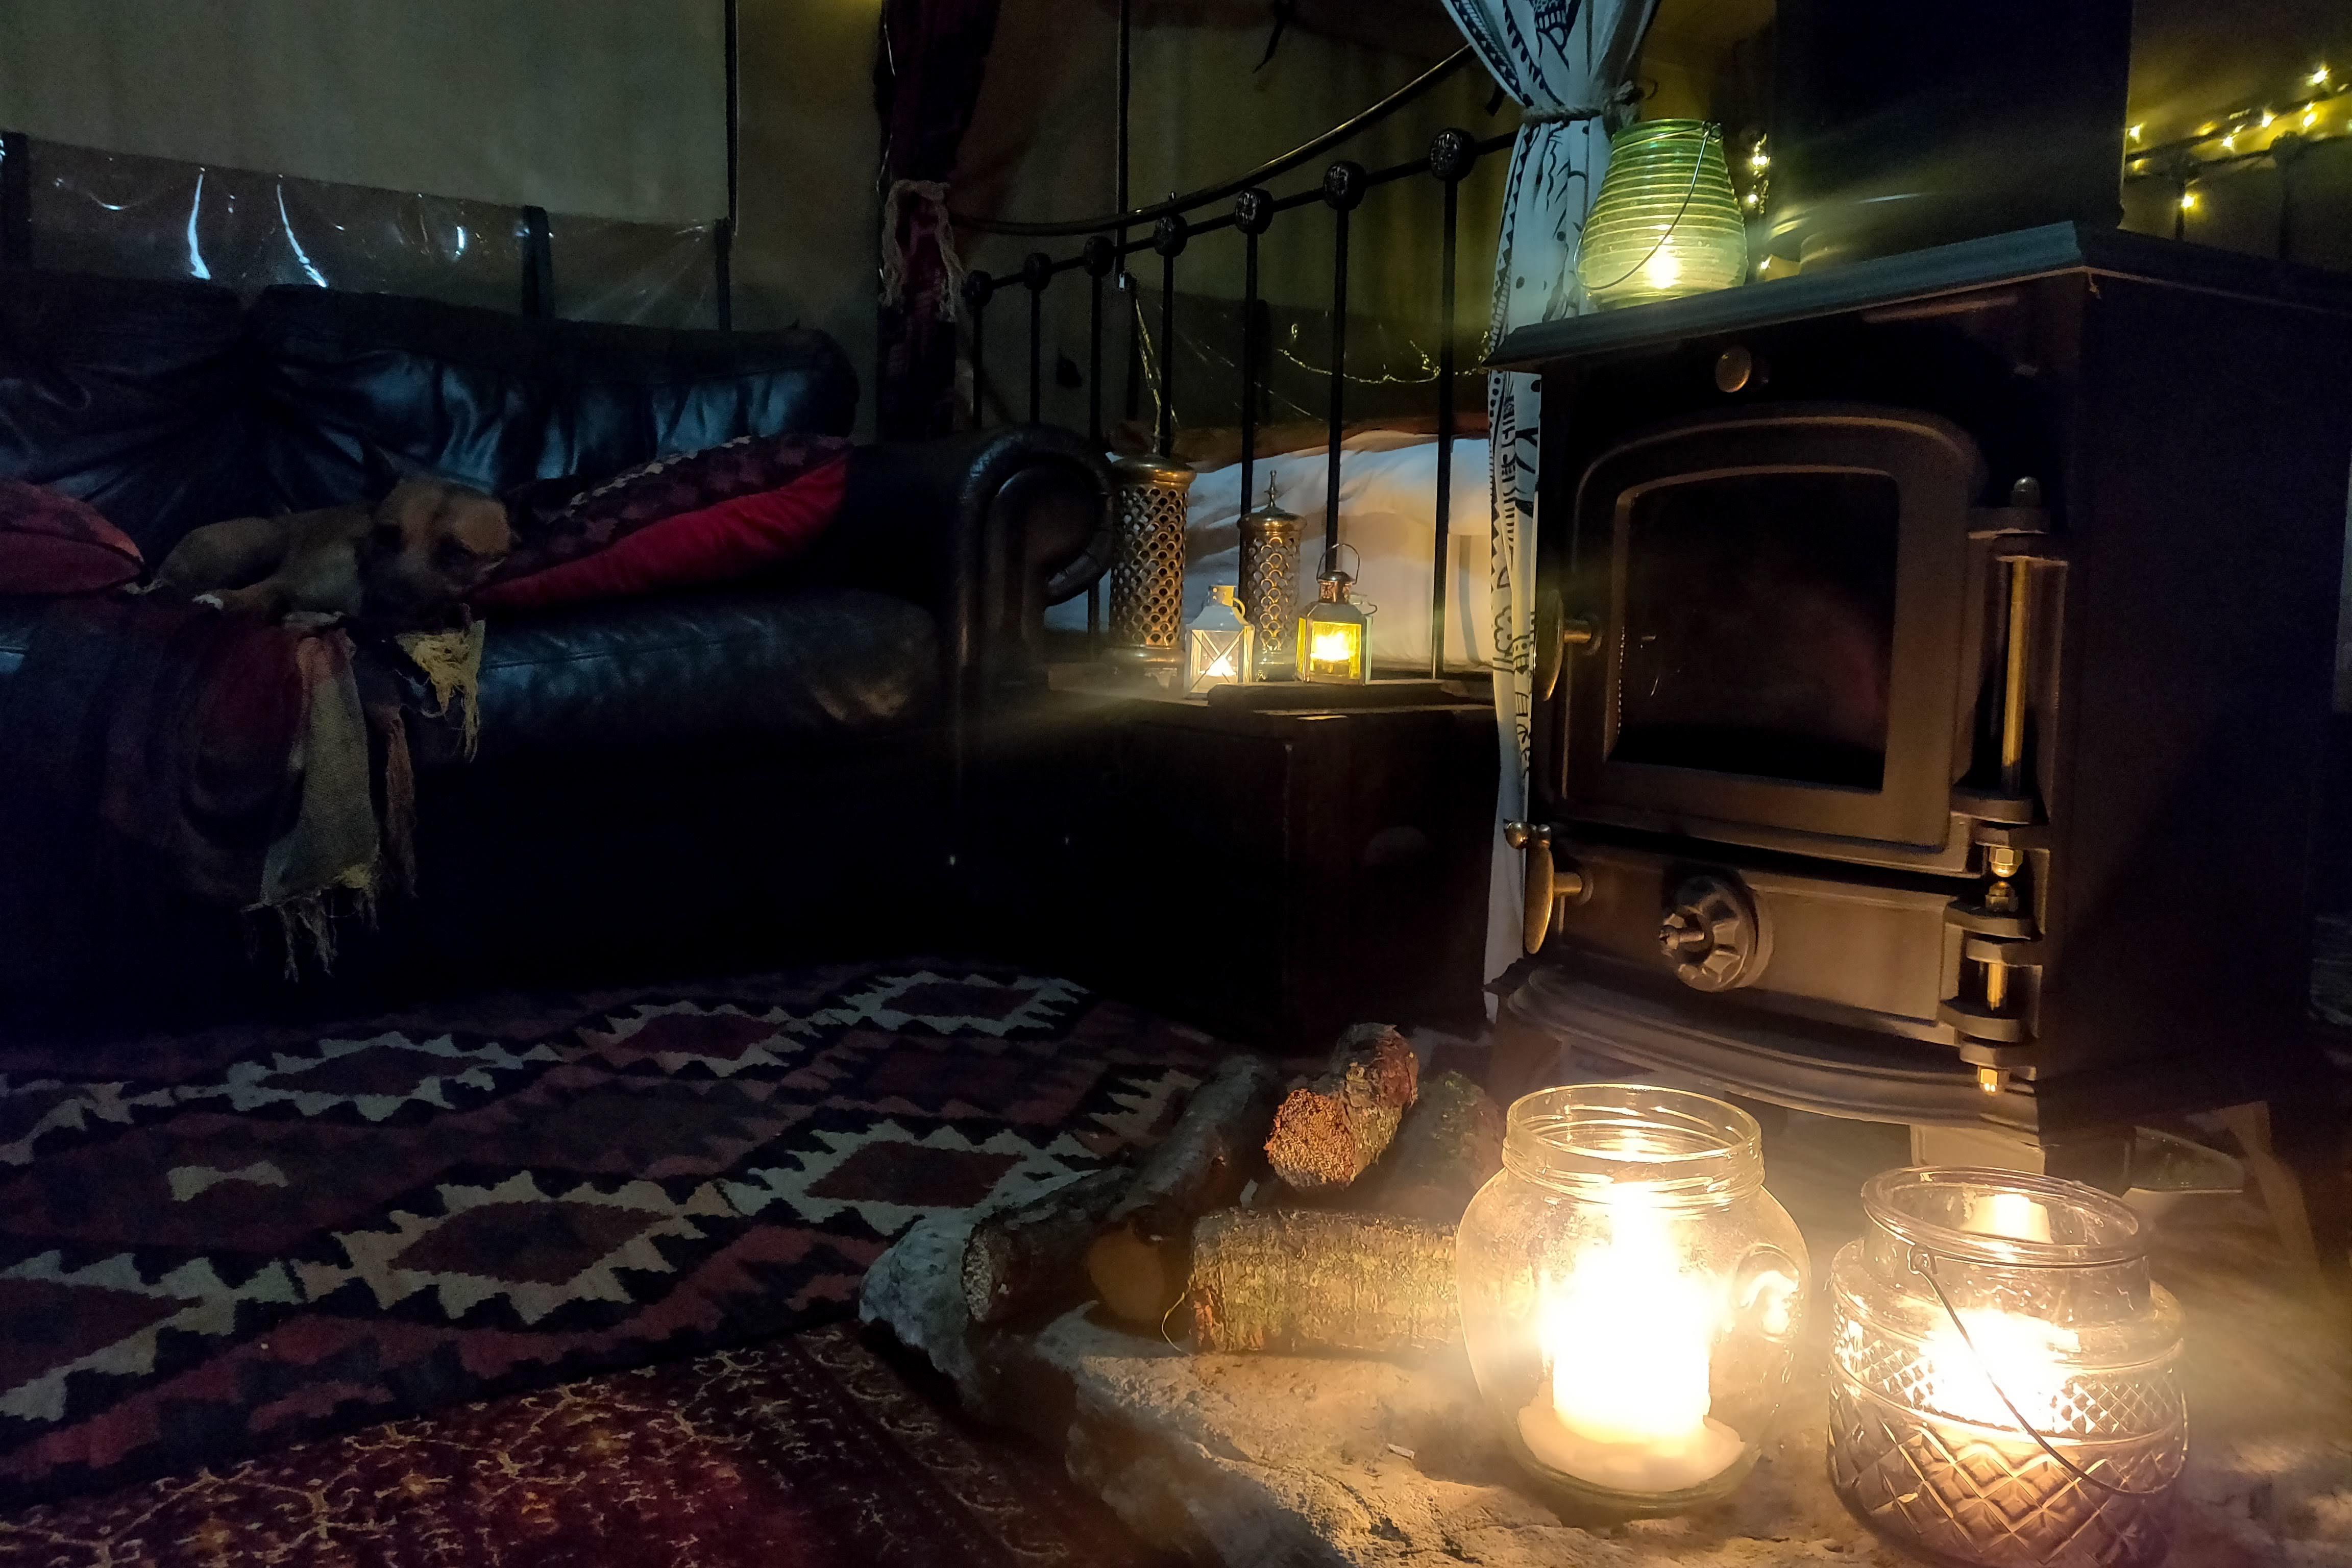 The log burner at night